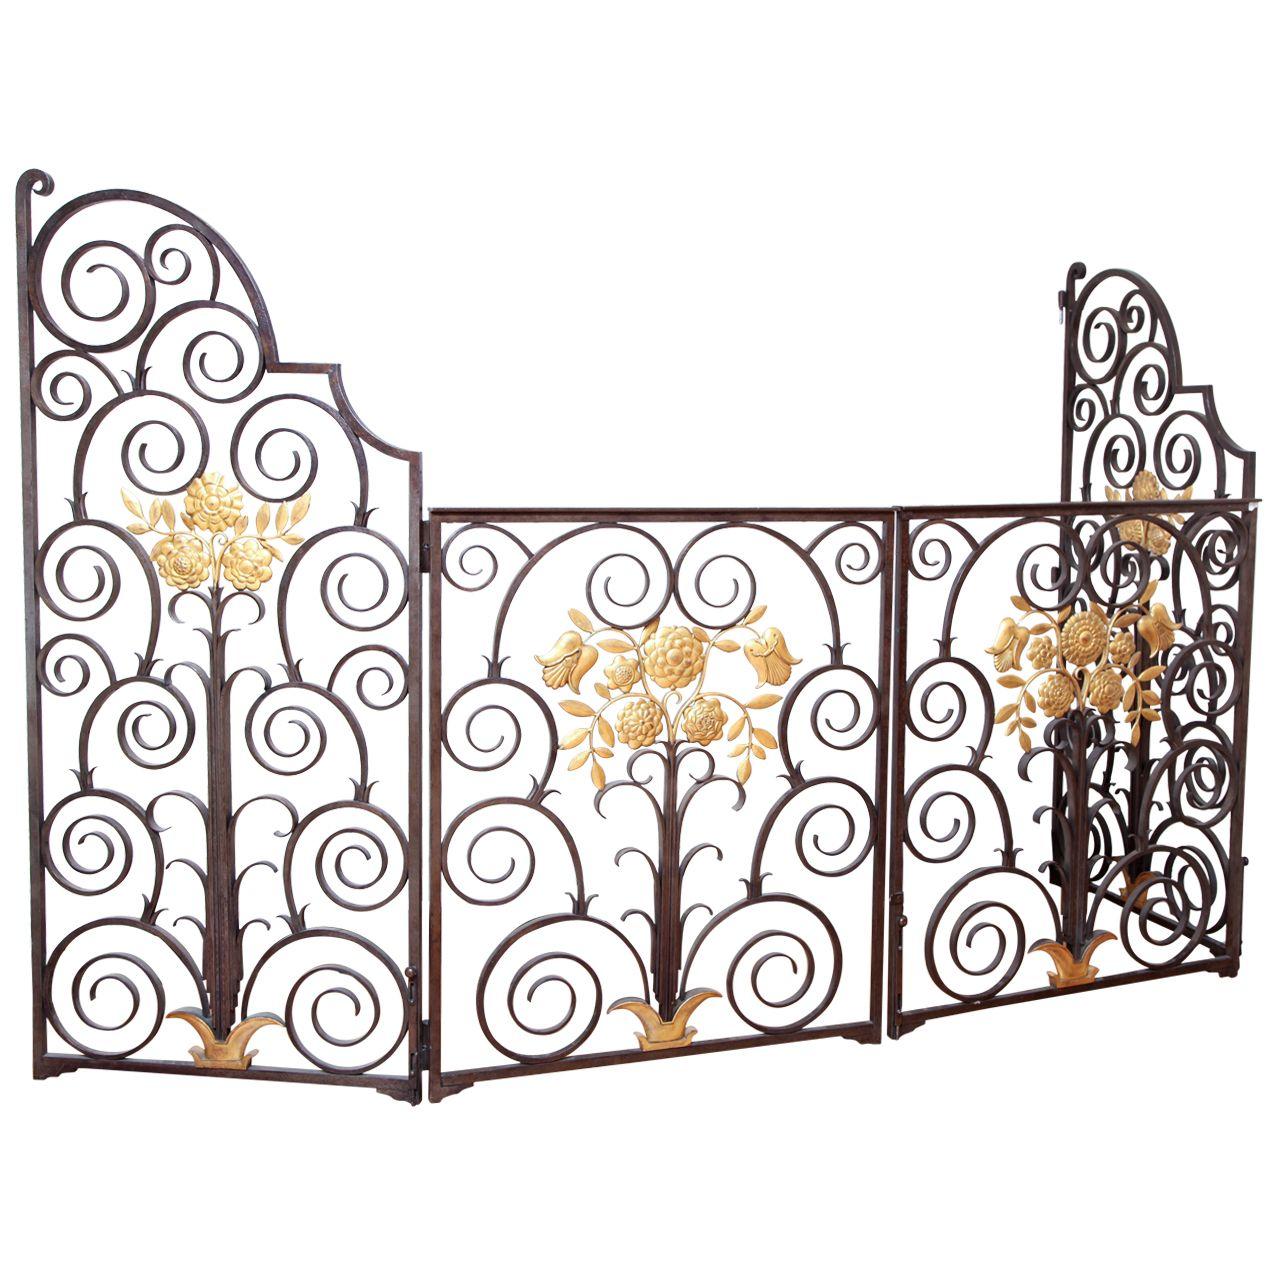 French s wrought iron screengate garden doors wrought iron